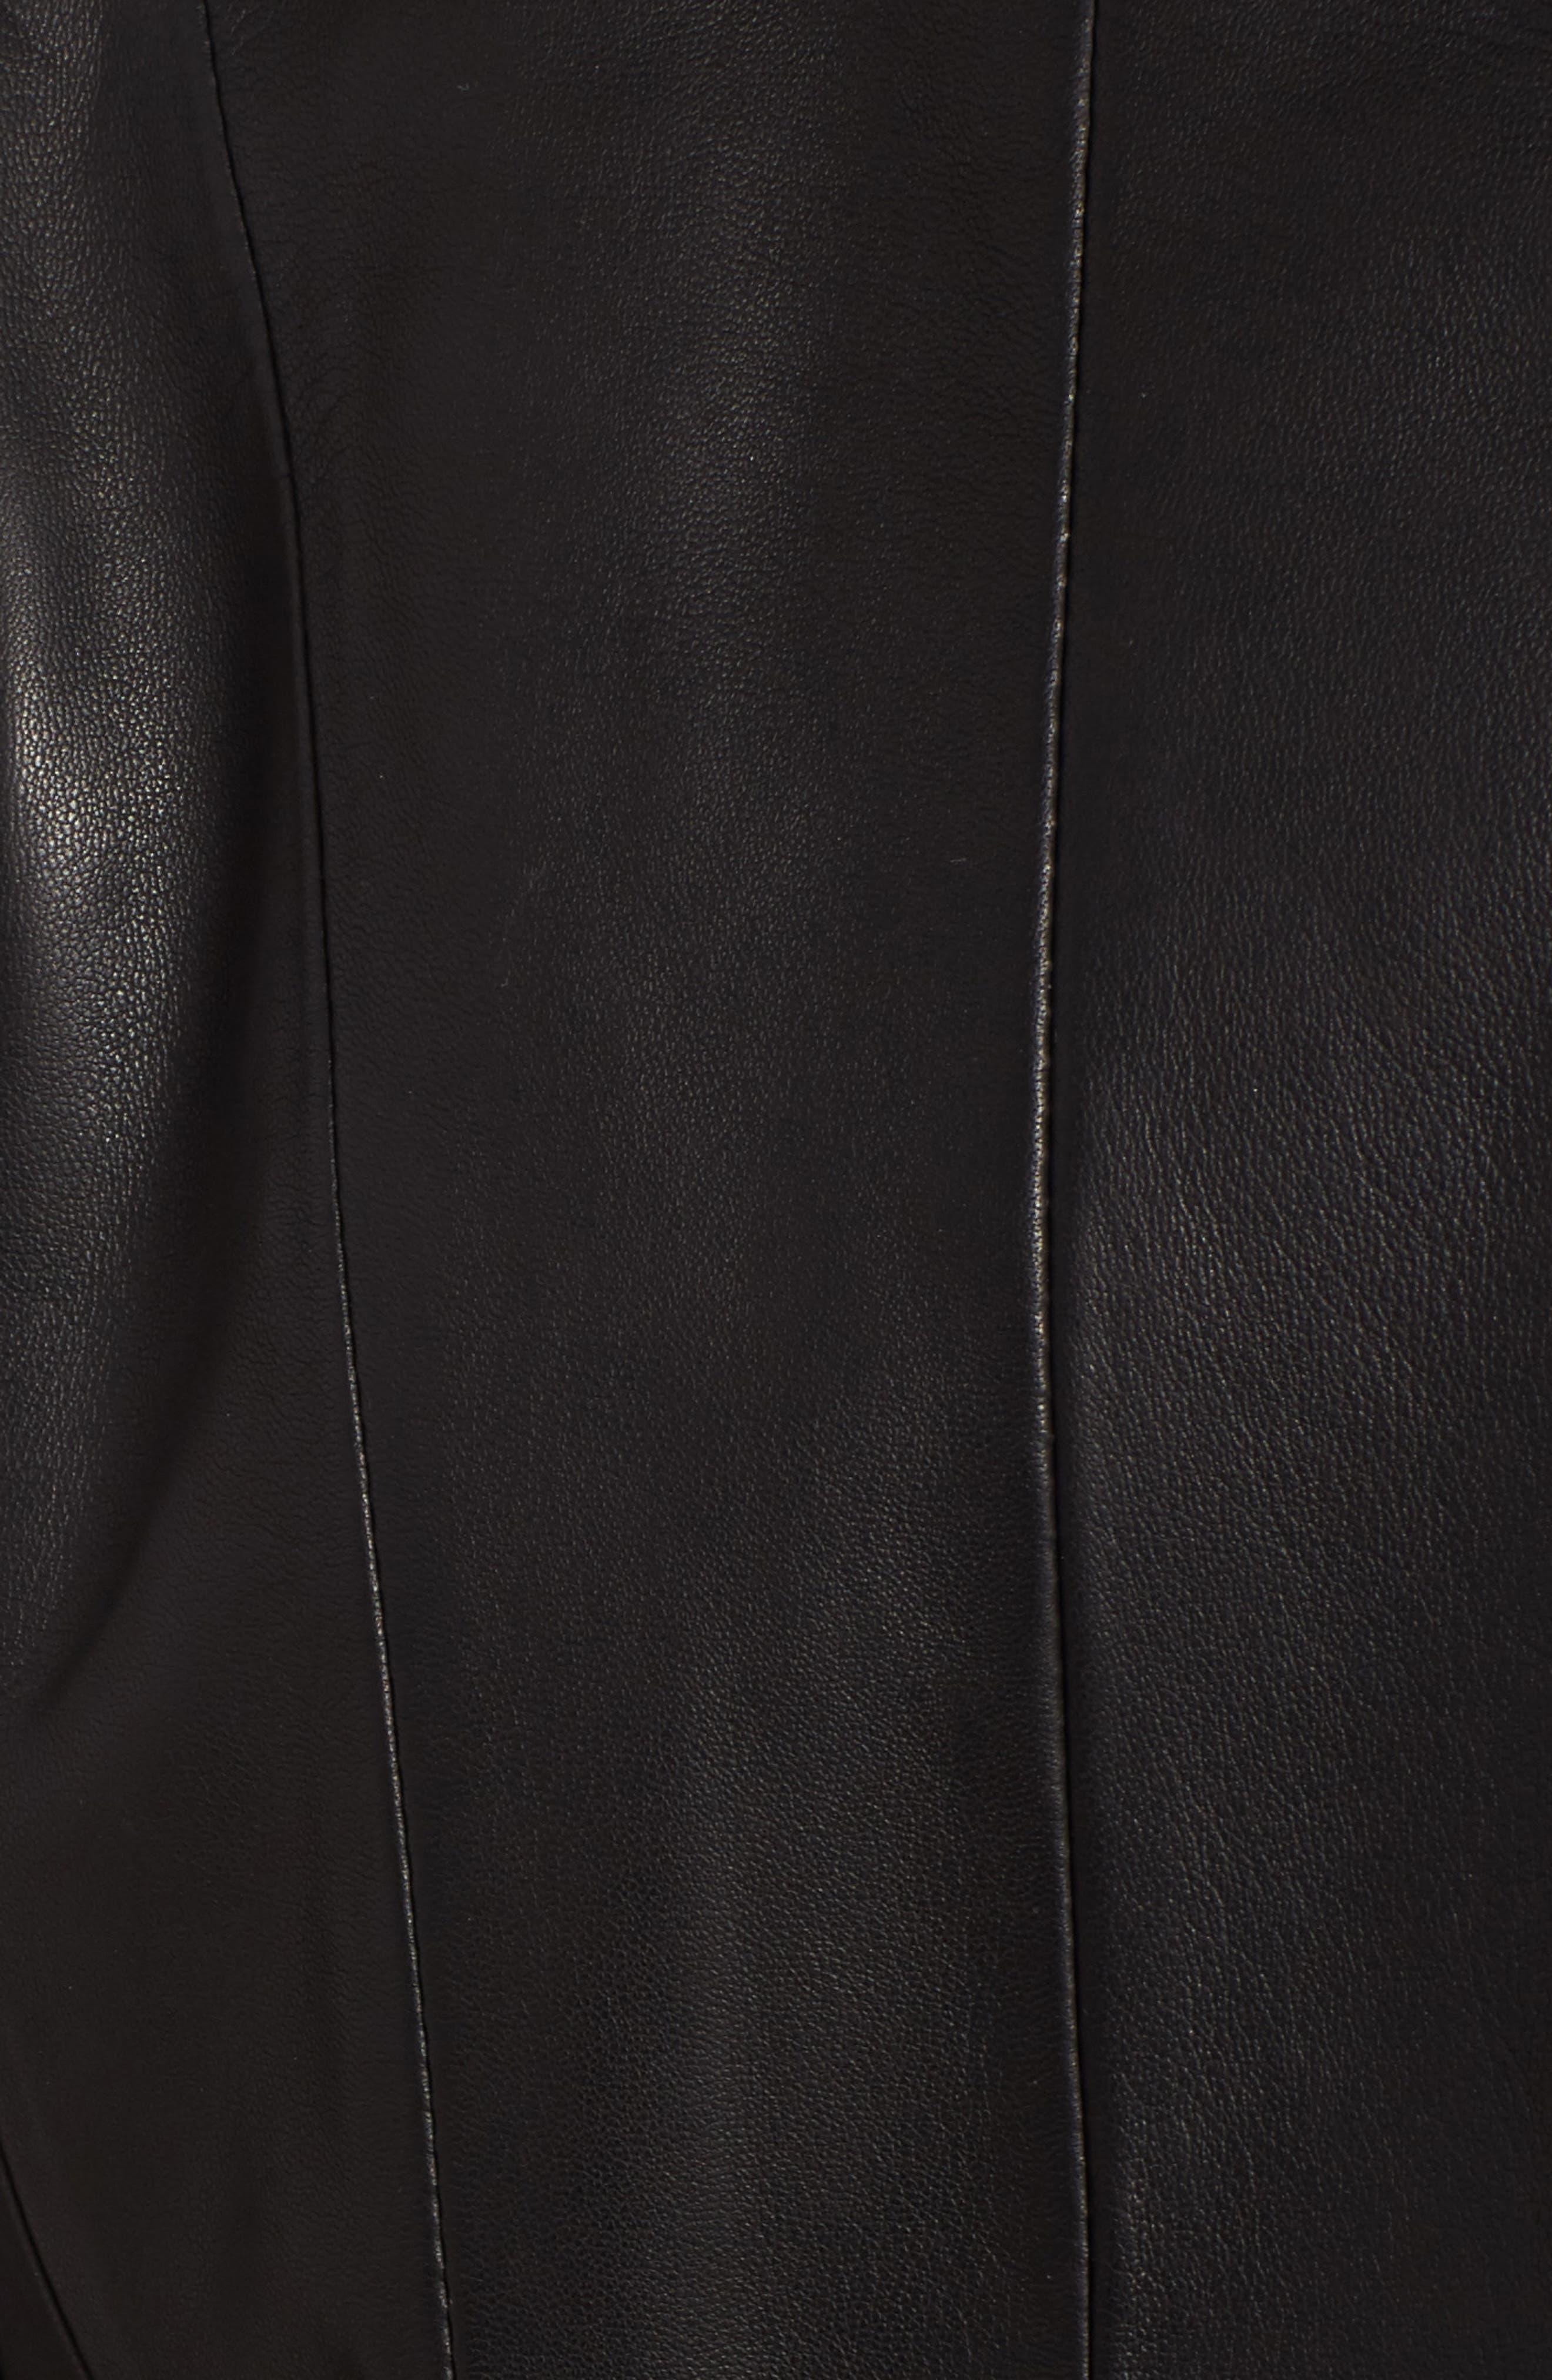 Leather Car Coat,                             Alternate thumbnail 5, color,                             Black